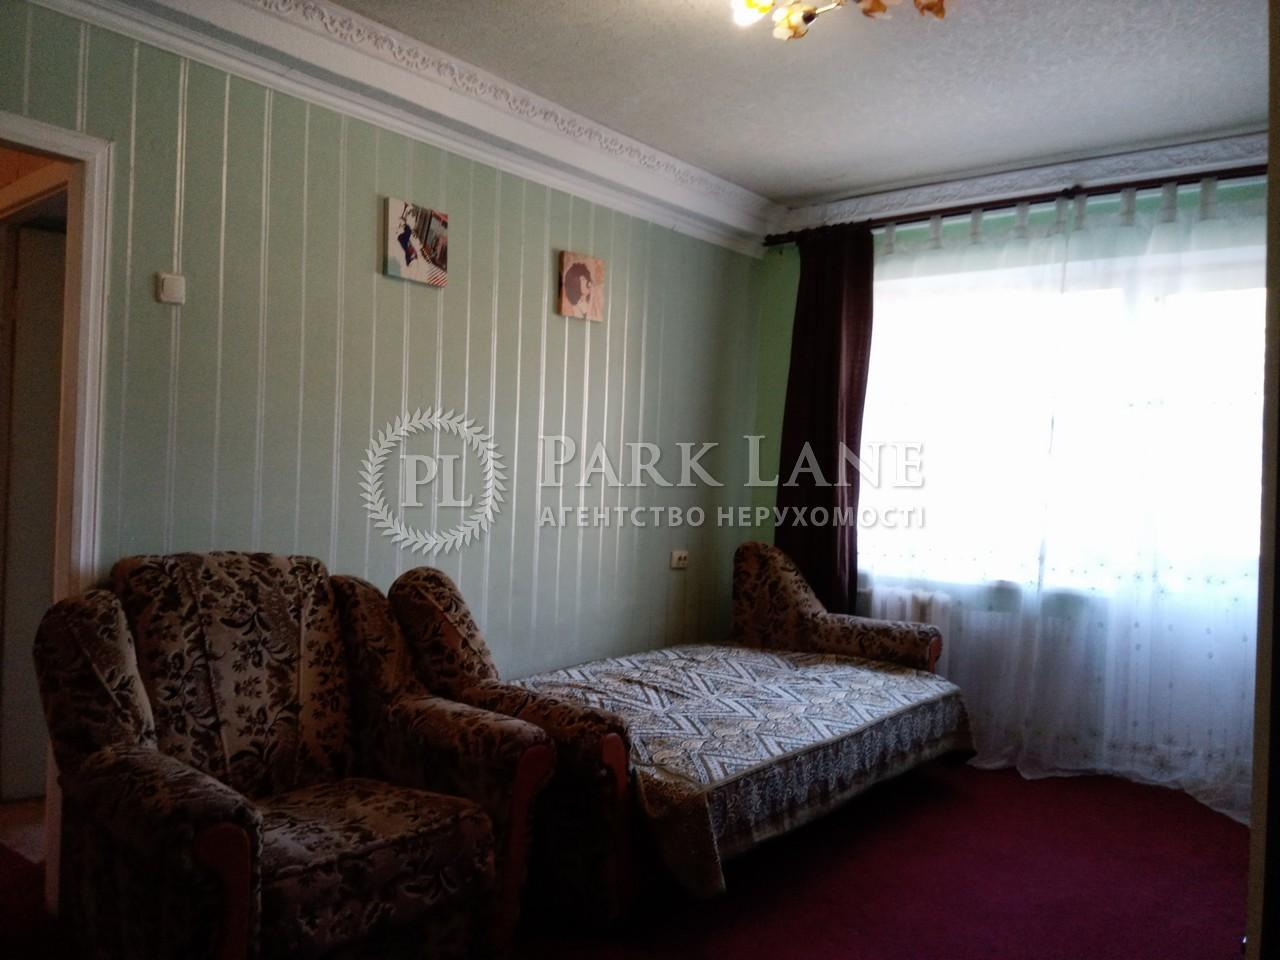 Квартира ул. Сеченова, 10 корпус 2, Киев, Z-1688081 - Фото 8